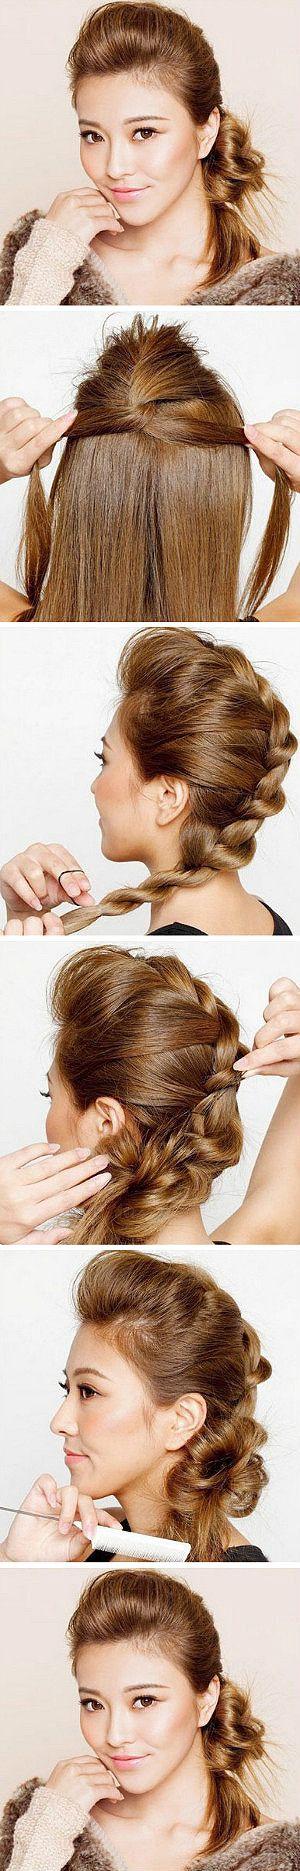 braiding hair poof